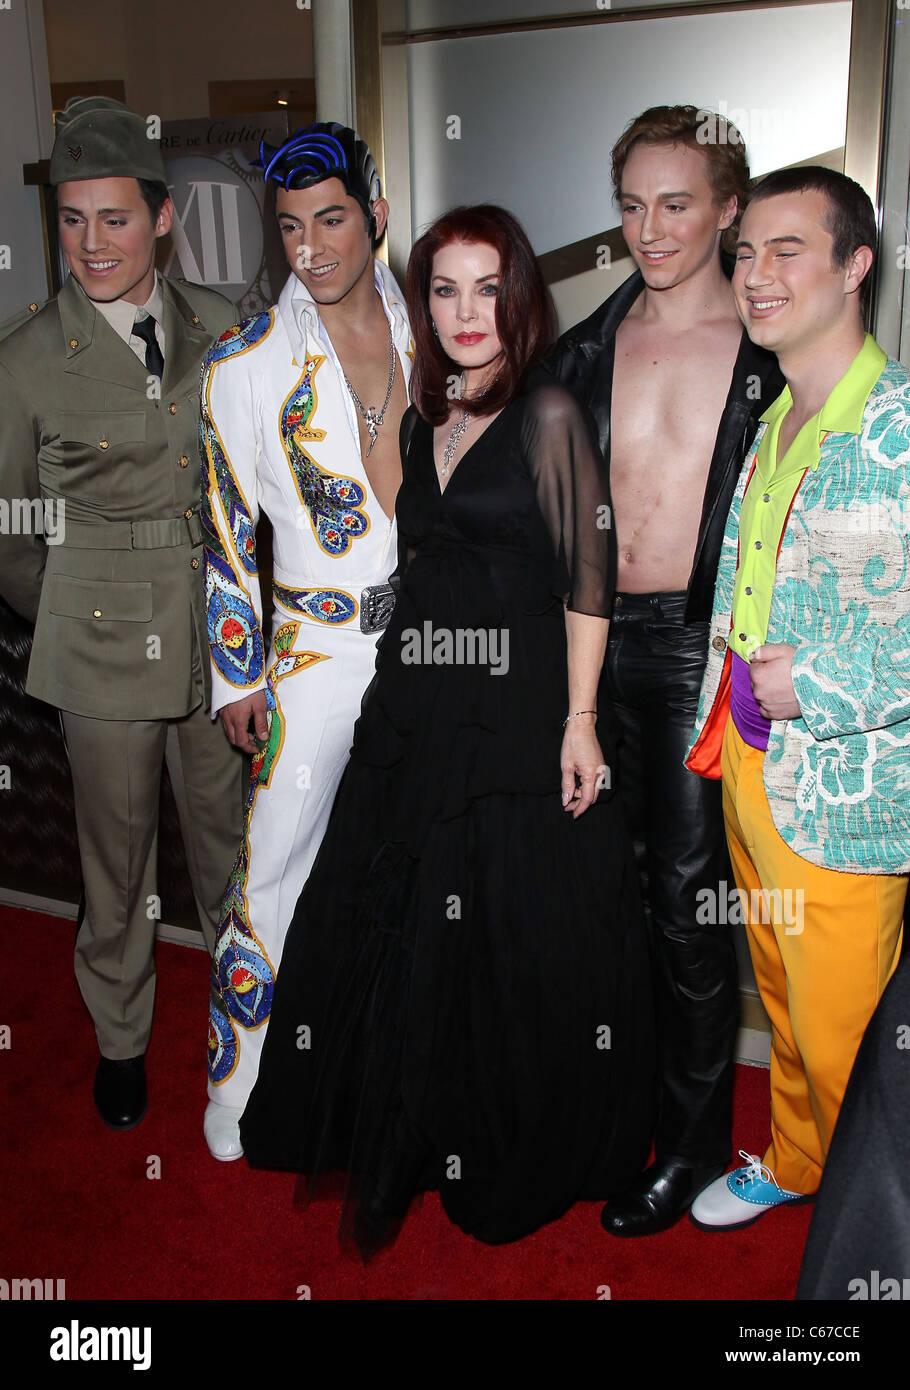 Priscilla Presley, Viva Elvis cast members in attendance for Nevada Ballet Theatre Annual Black and White Ball, - Stock Image